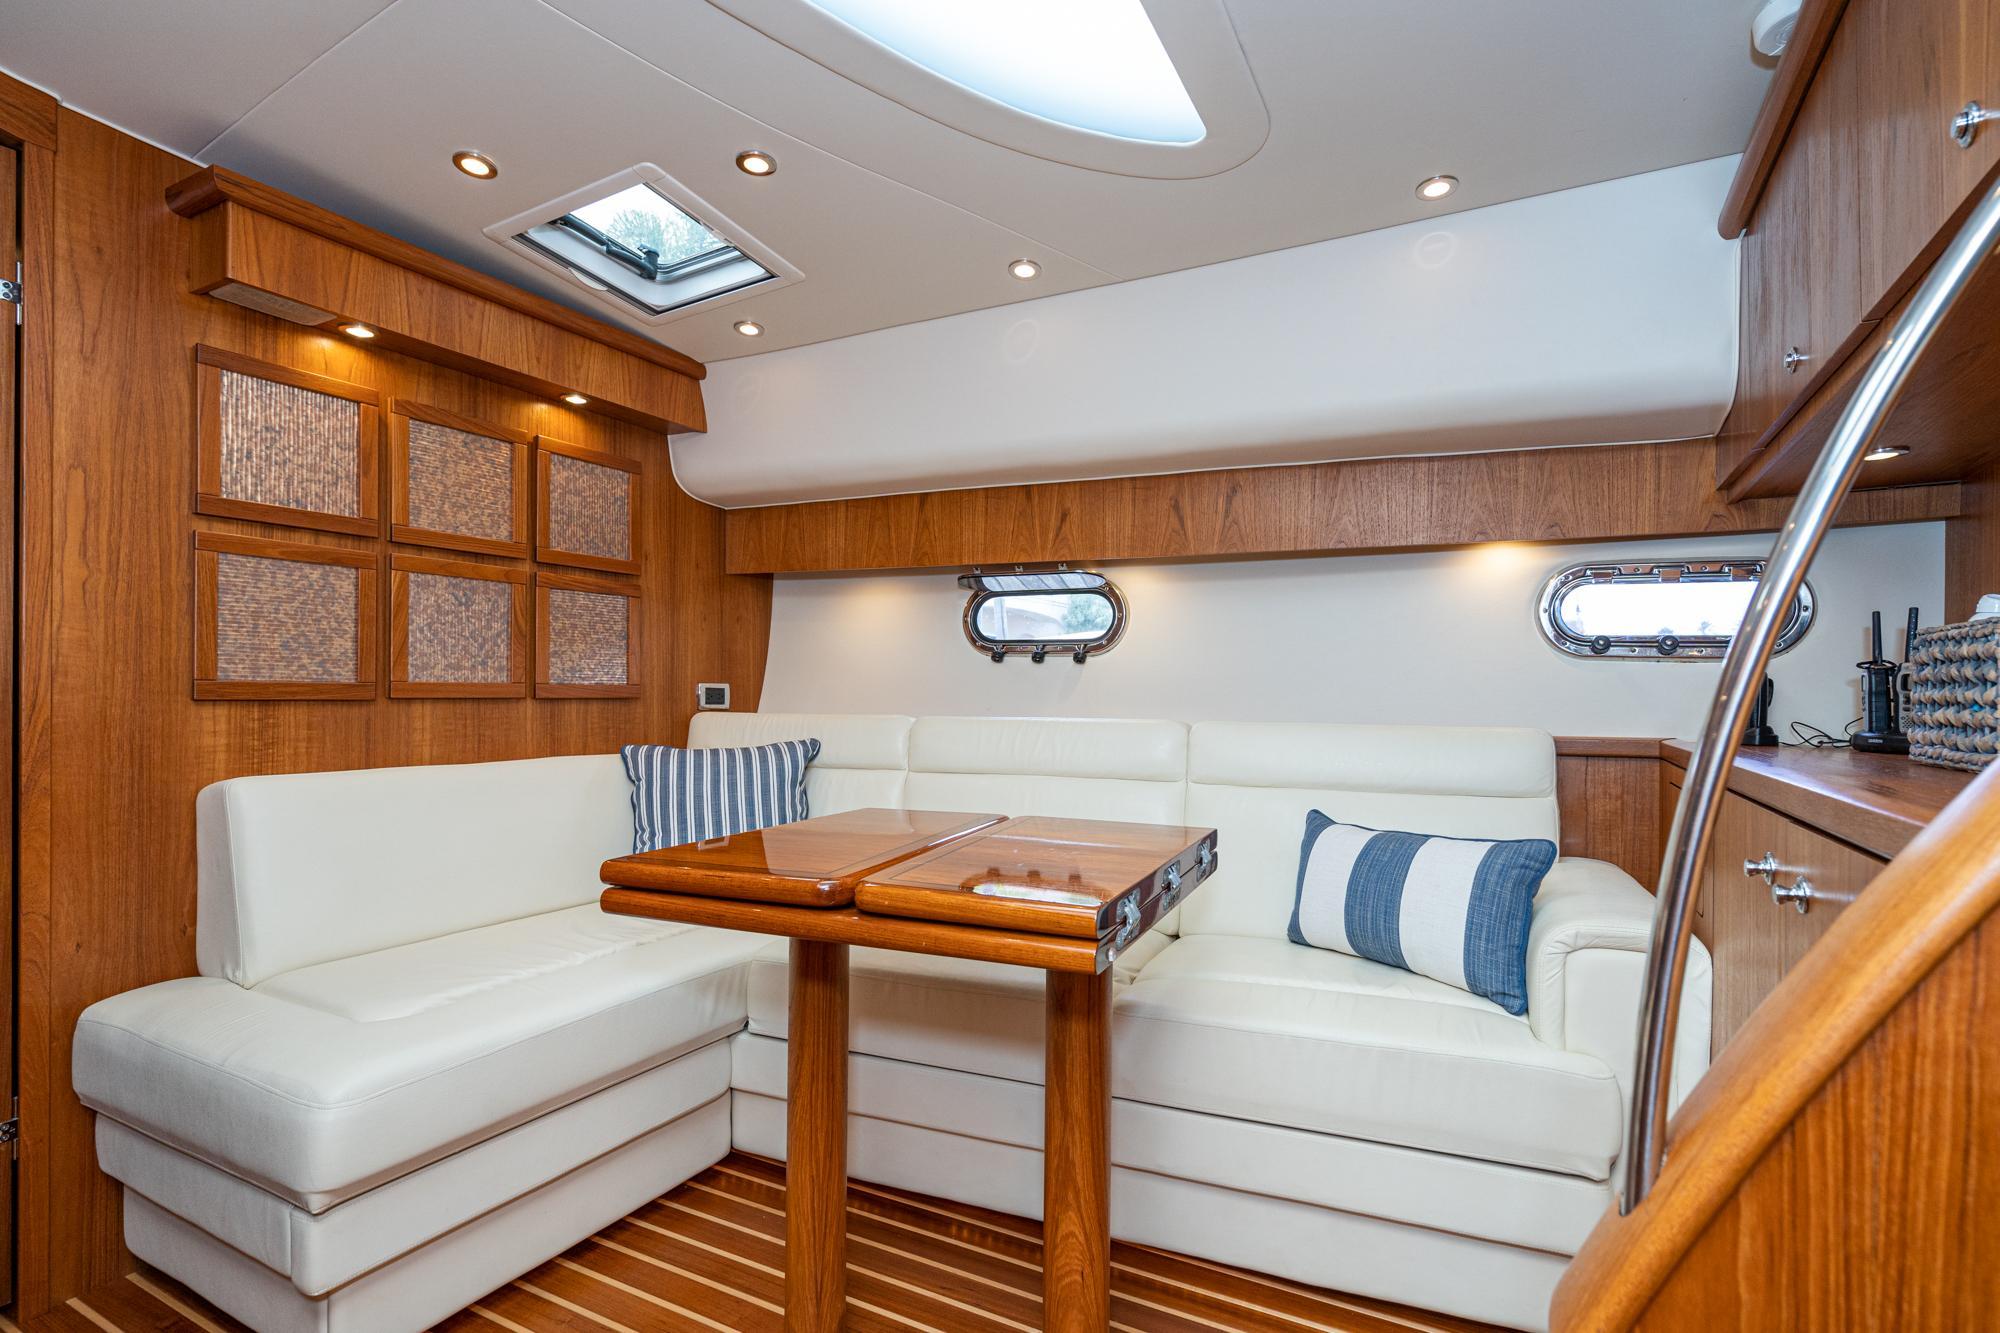 2012 Tiara Yachts 4500 Sovran #TBE014DH-LLC inventory image at Sun Country Coastal in Dana Point